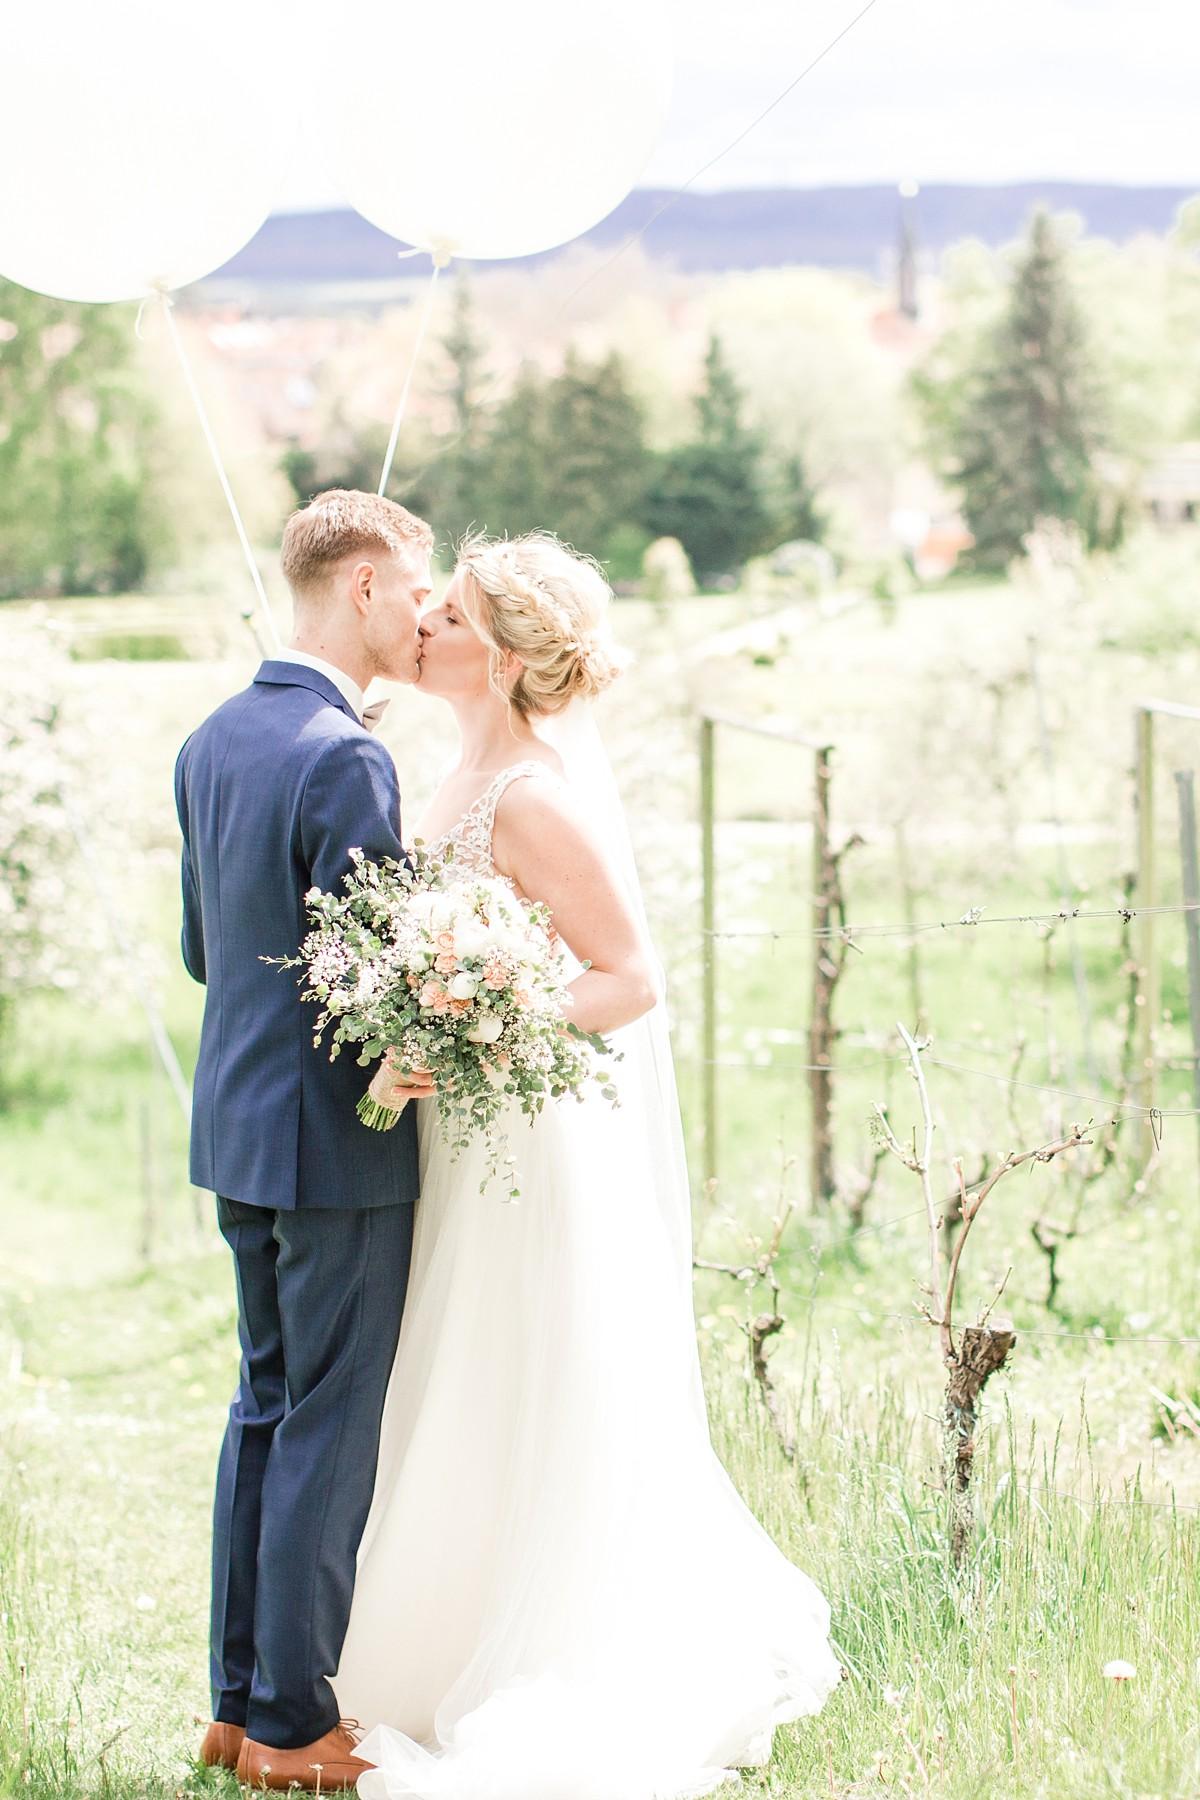 Hochzeitsfotograf-Hildesheim-Hannover-Fotograf_0070